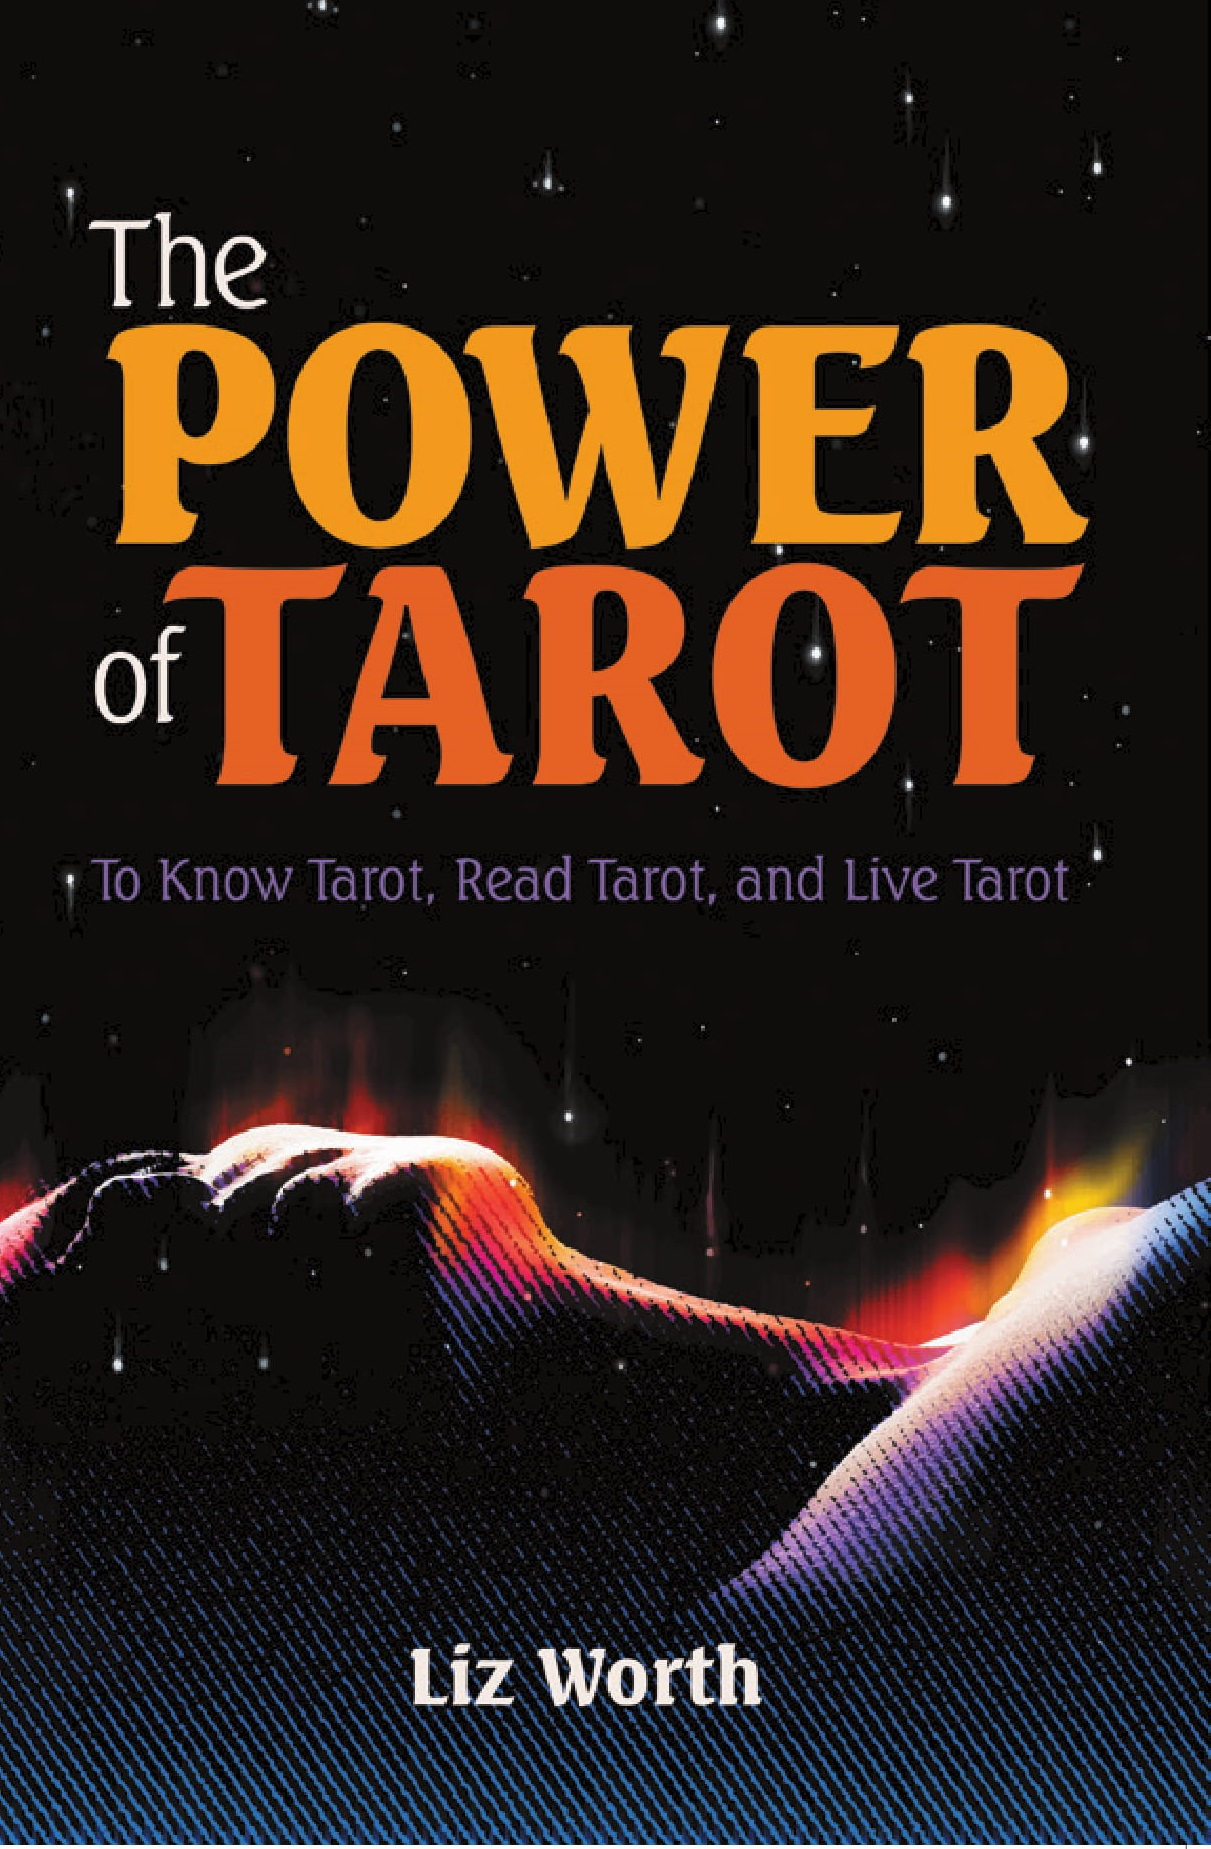 Find The Power of Tarot on  Lulu  or  Amazon